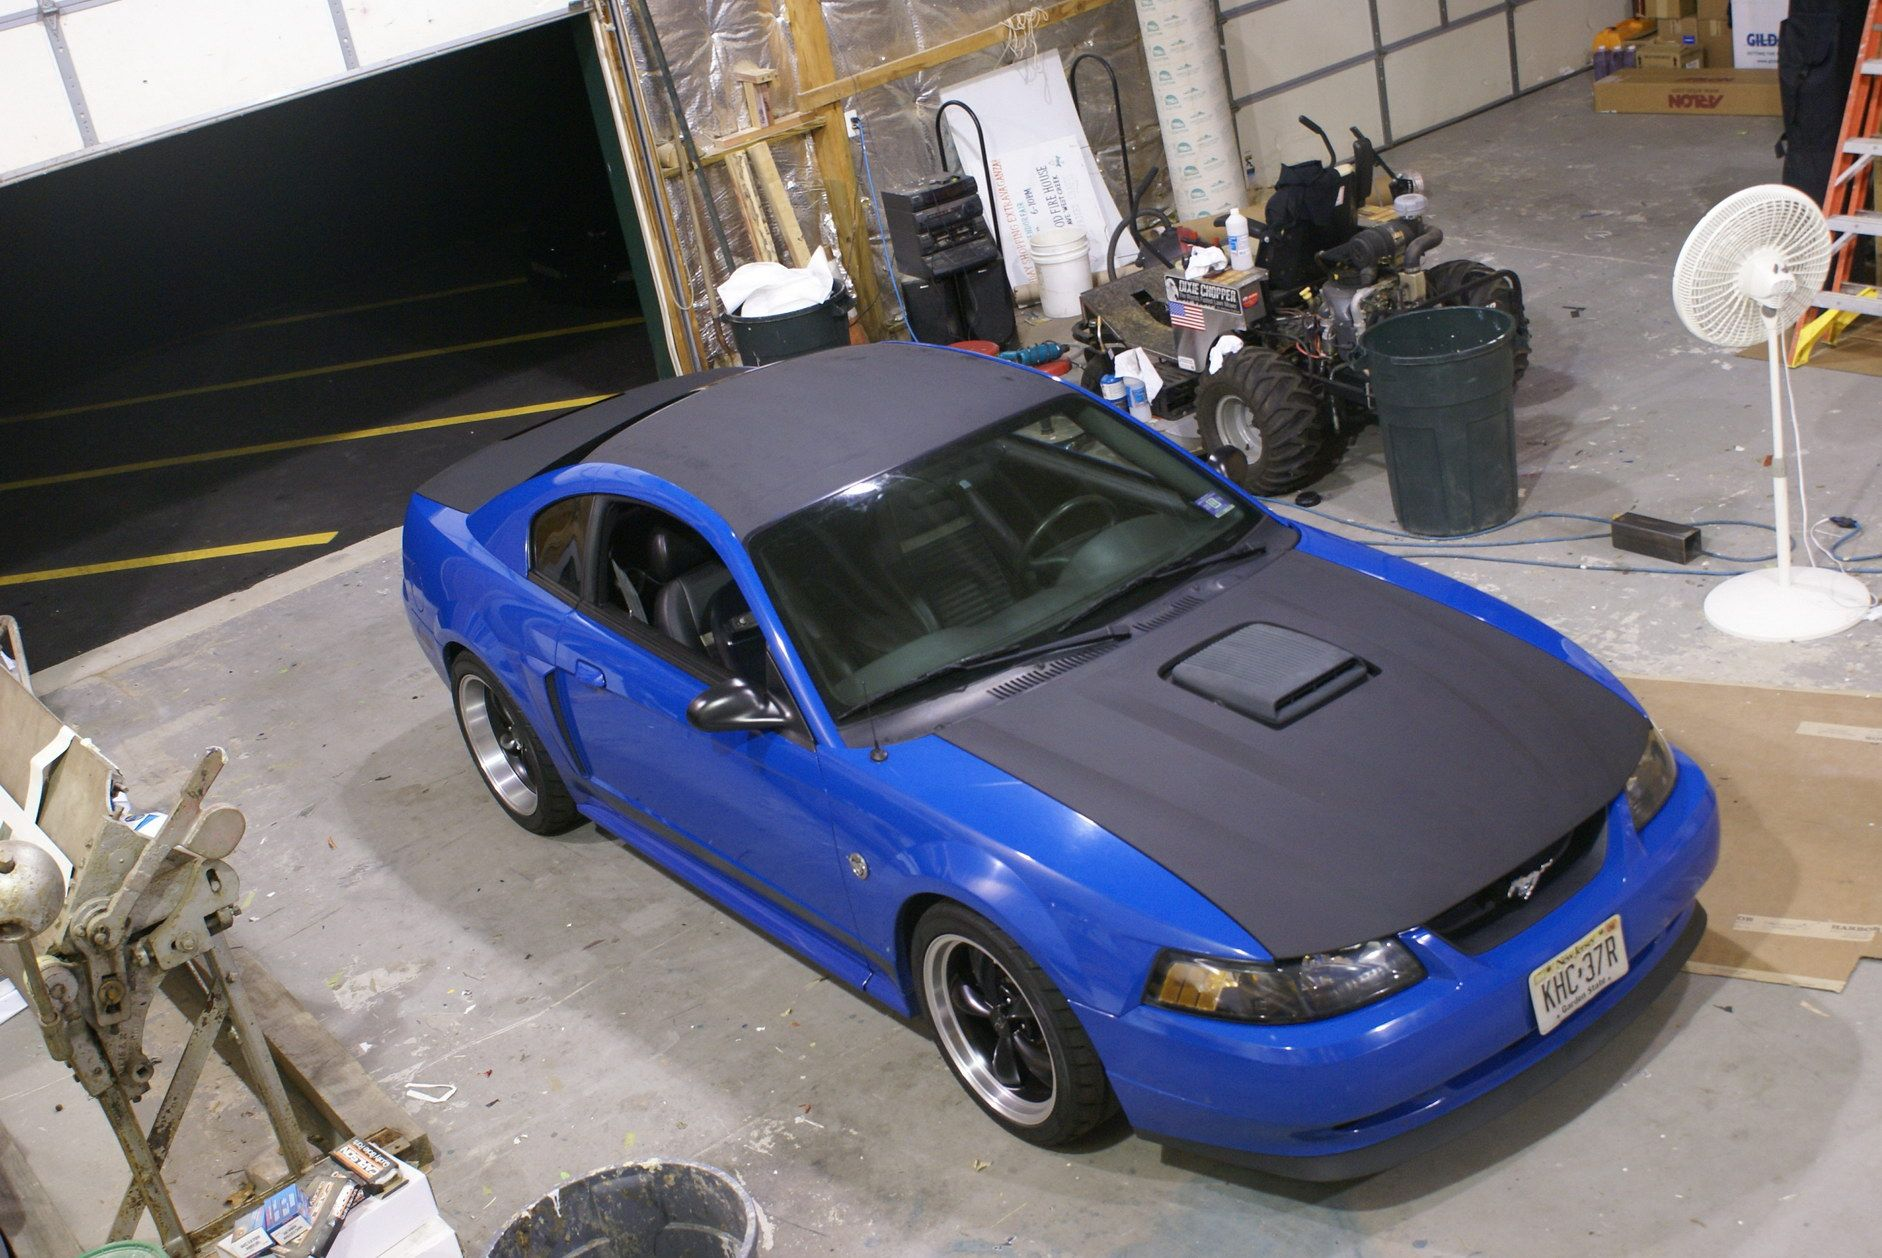 Blue Mustang Wrap 99 04 mustangs Pinterest